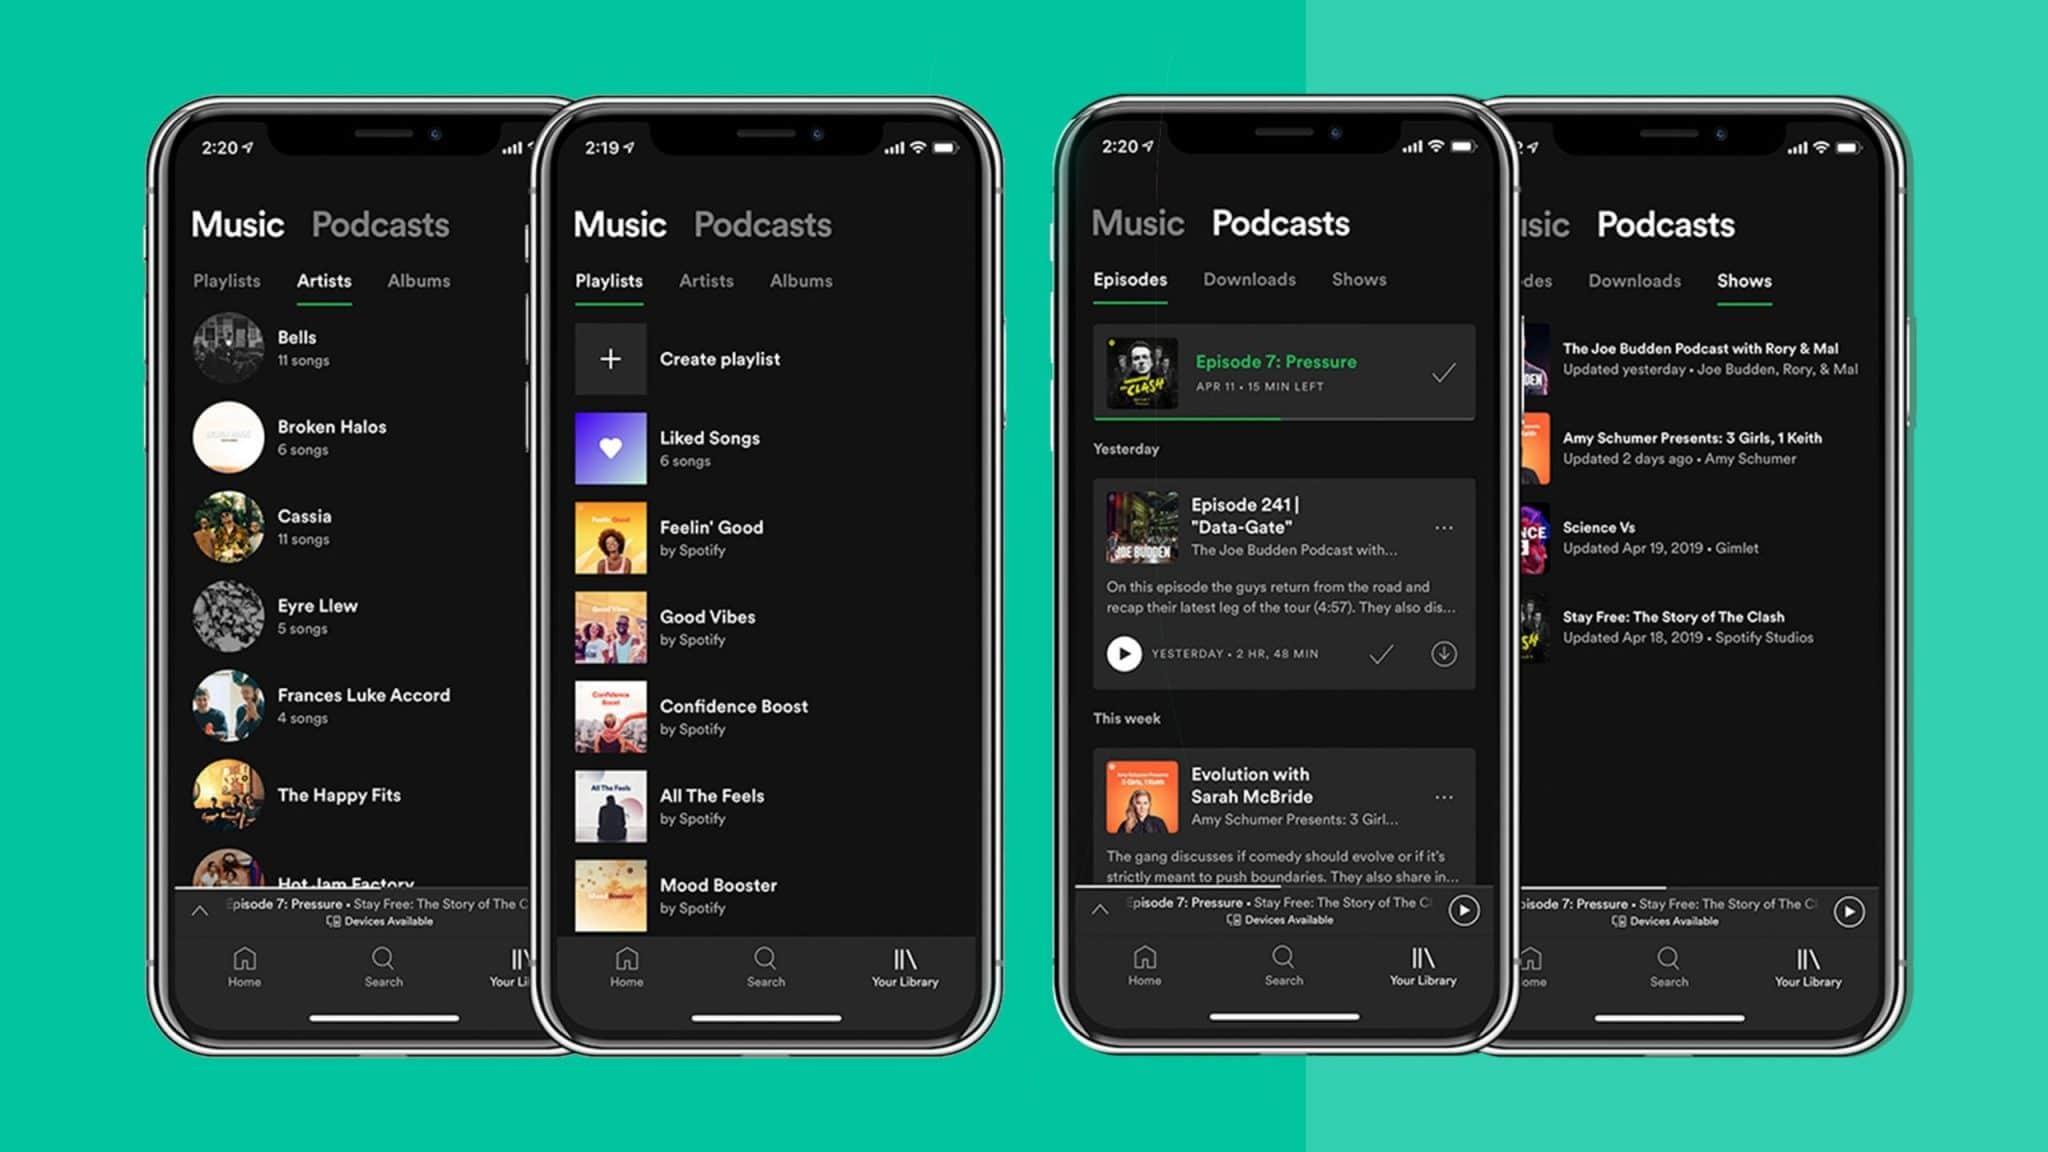 Spotify Podcast Elofizetes Podcast Gyujto Scaled